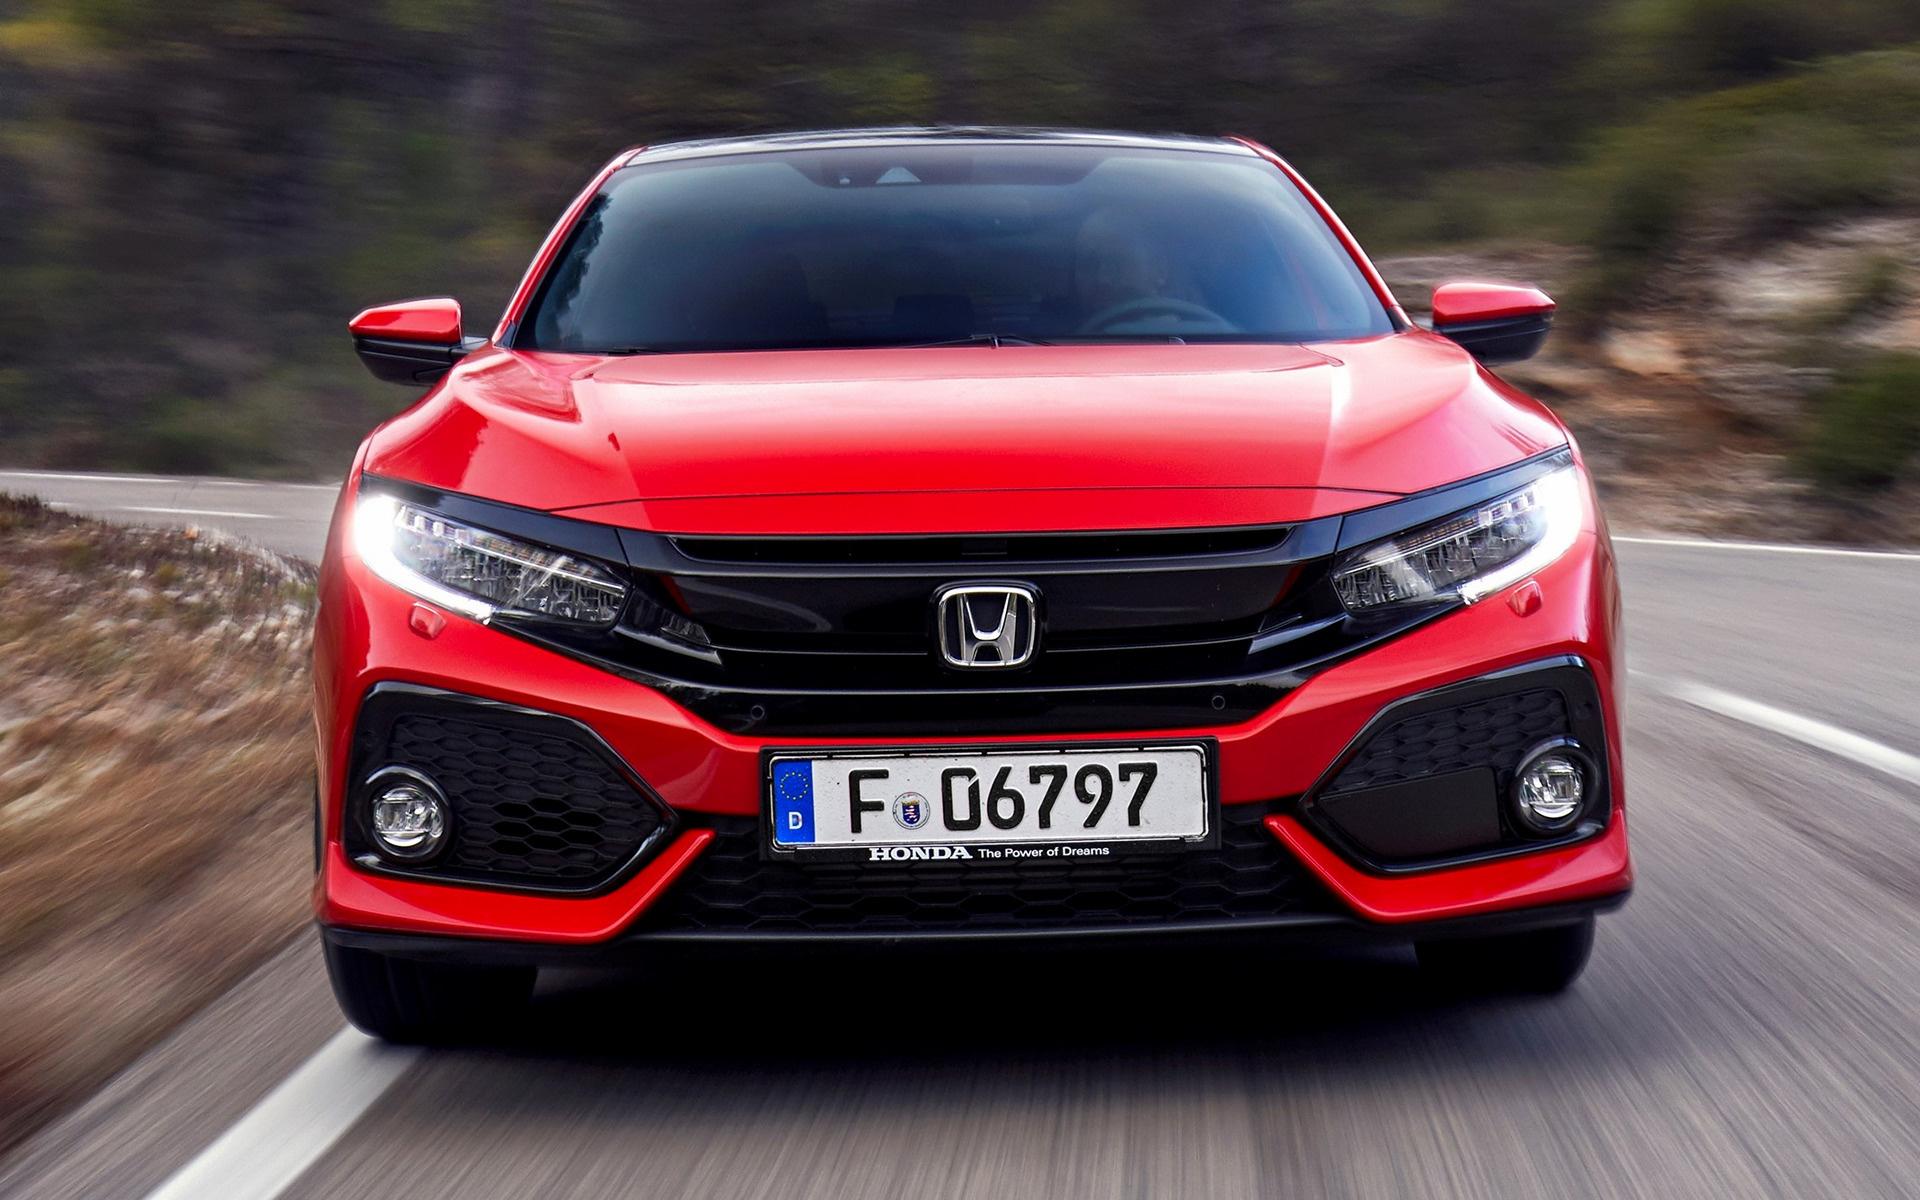 2017 Honda Civic Wallpapers And Hd Images Car Pixel